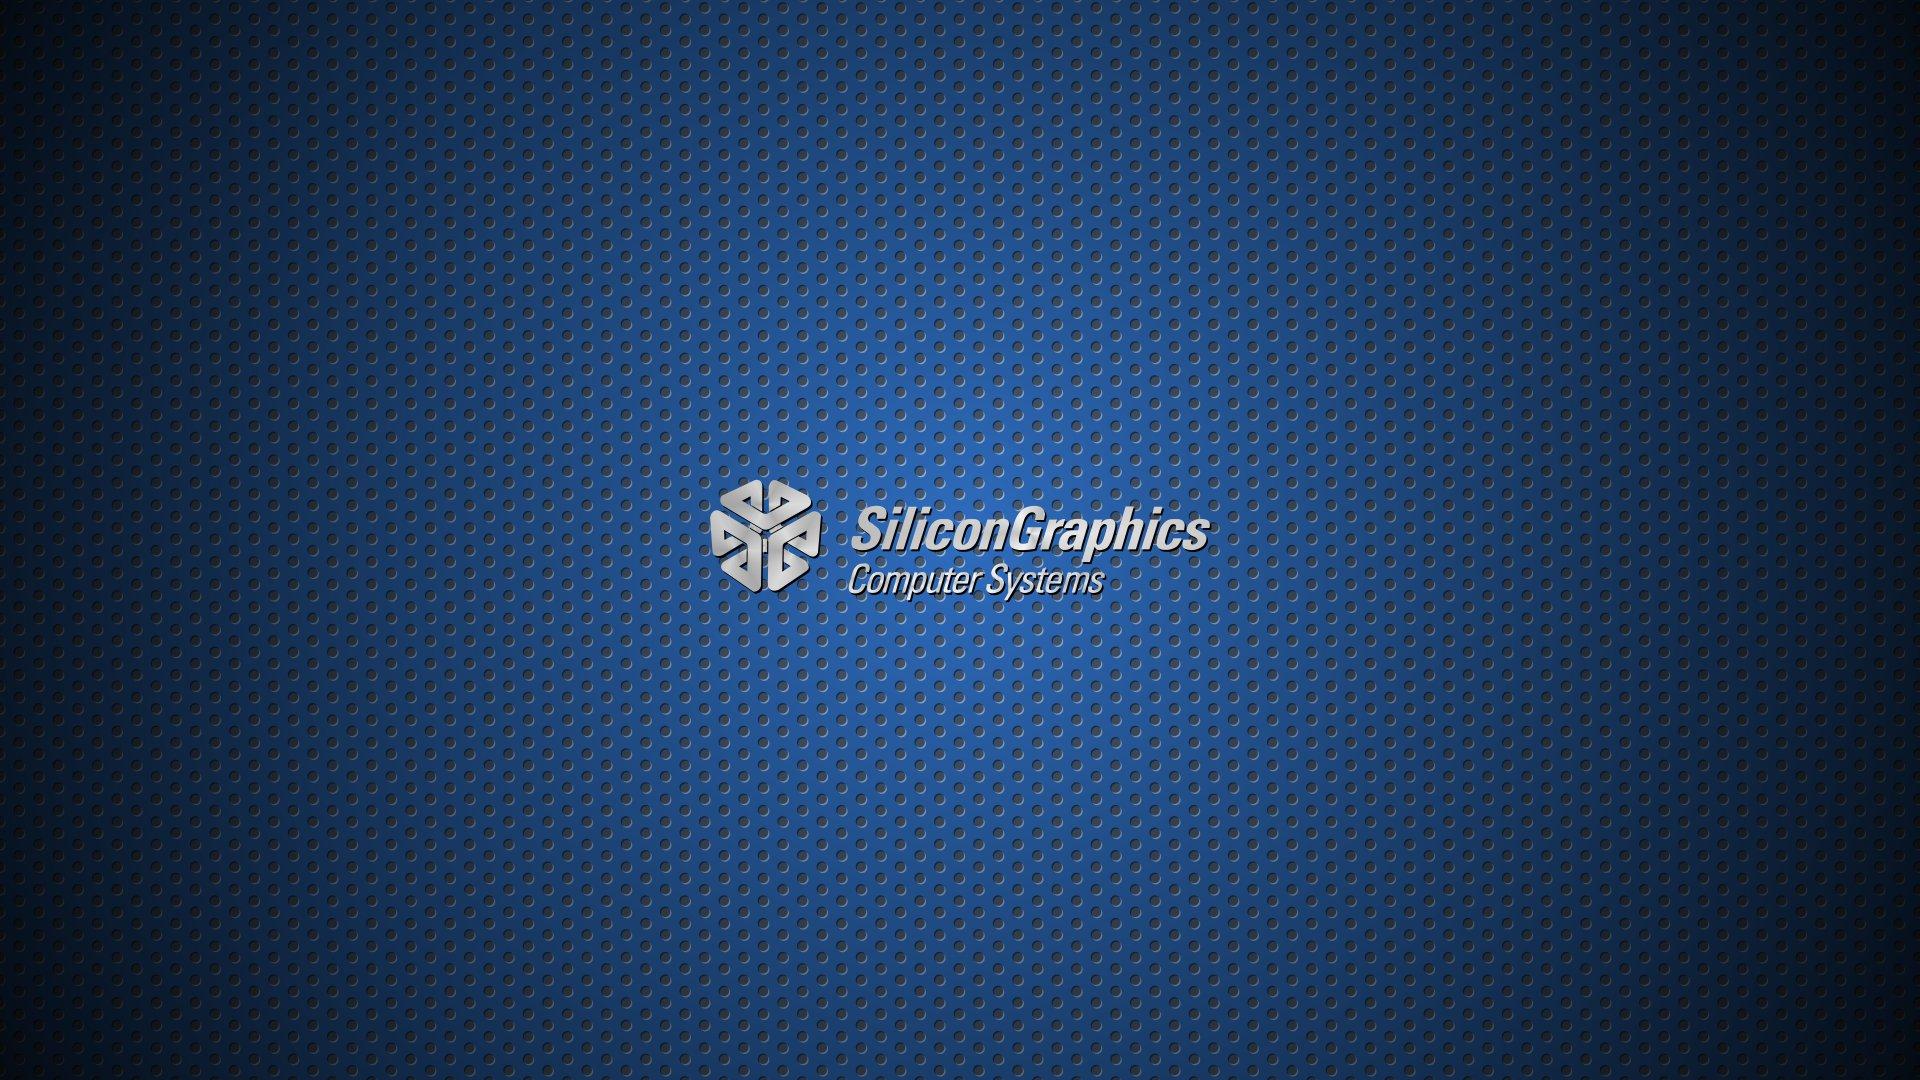 Time Wallpaper Hd Silicon Graphics Sgi 1920 X 1080 Hd Wallpaper